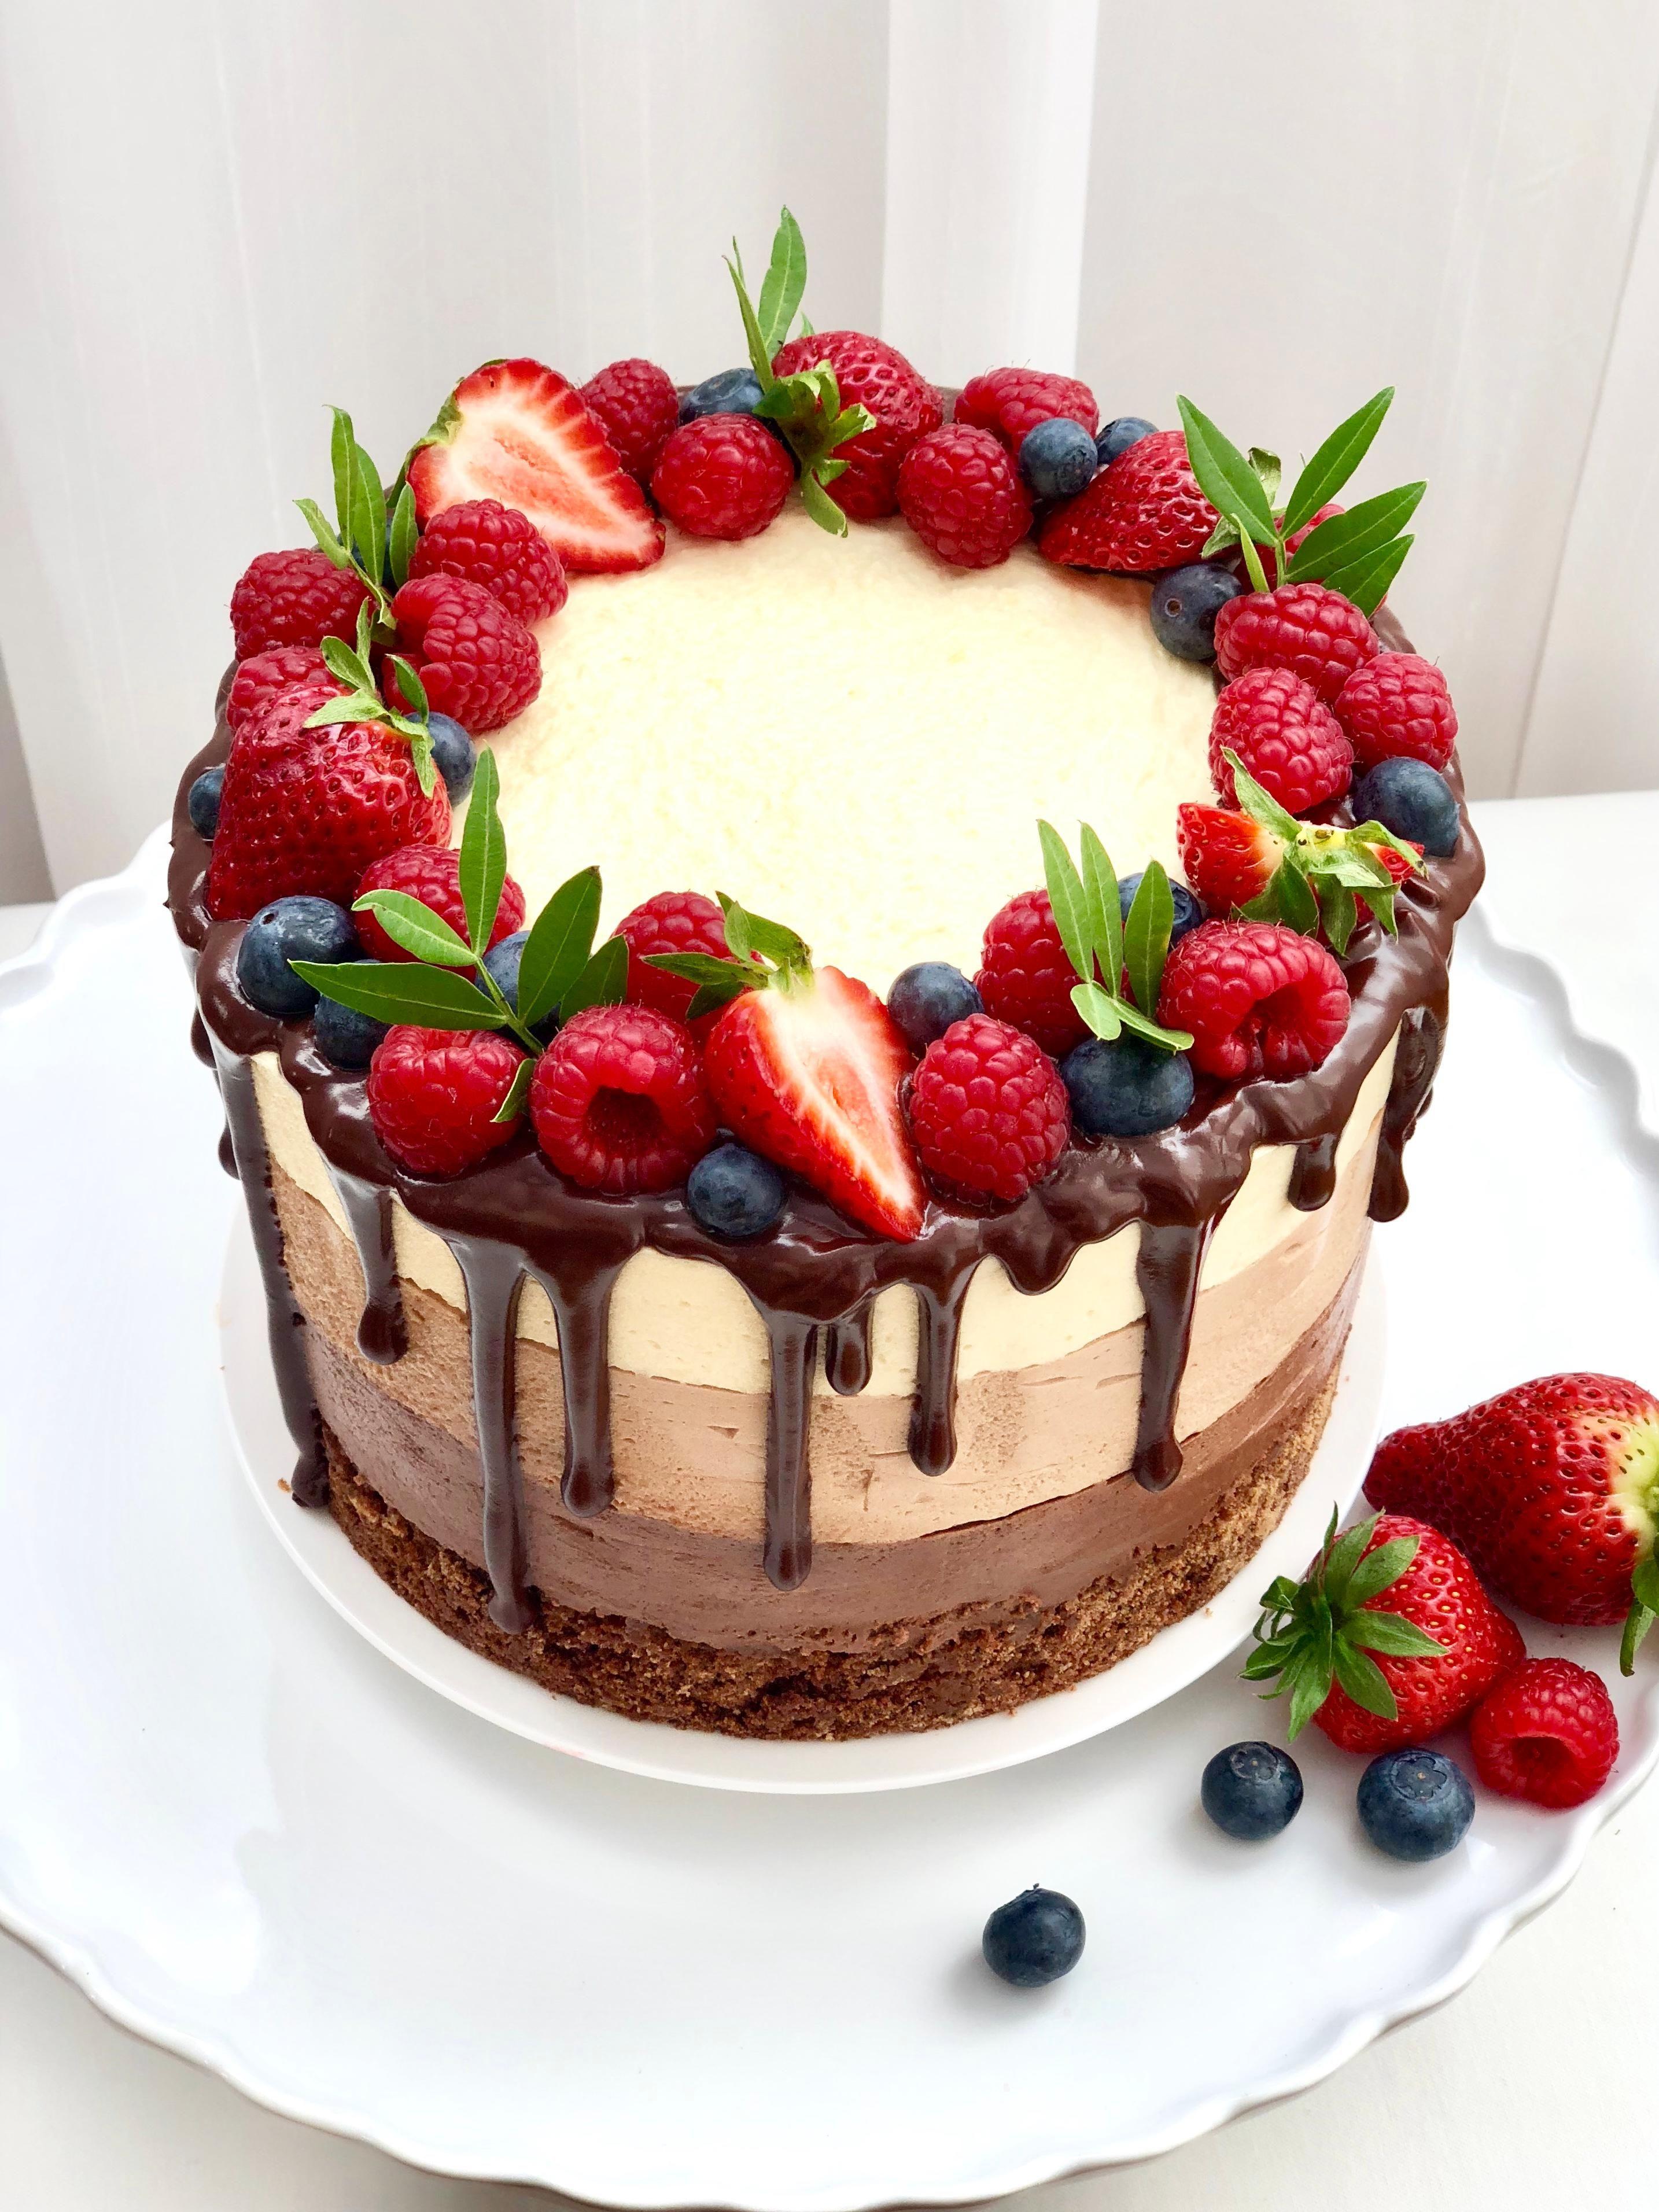 Картинки торт фруктами имеет